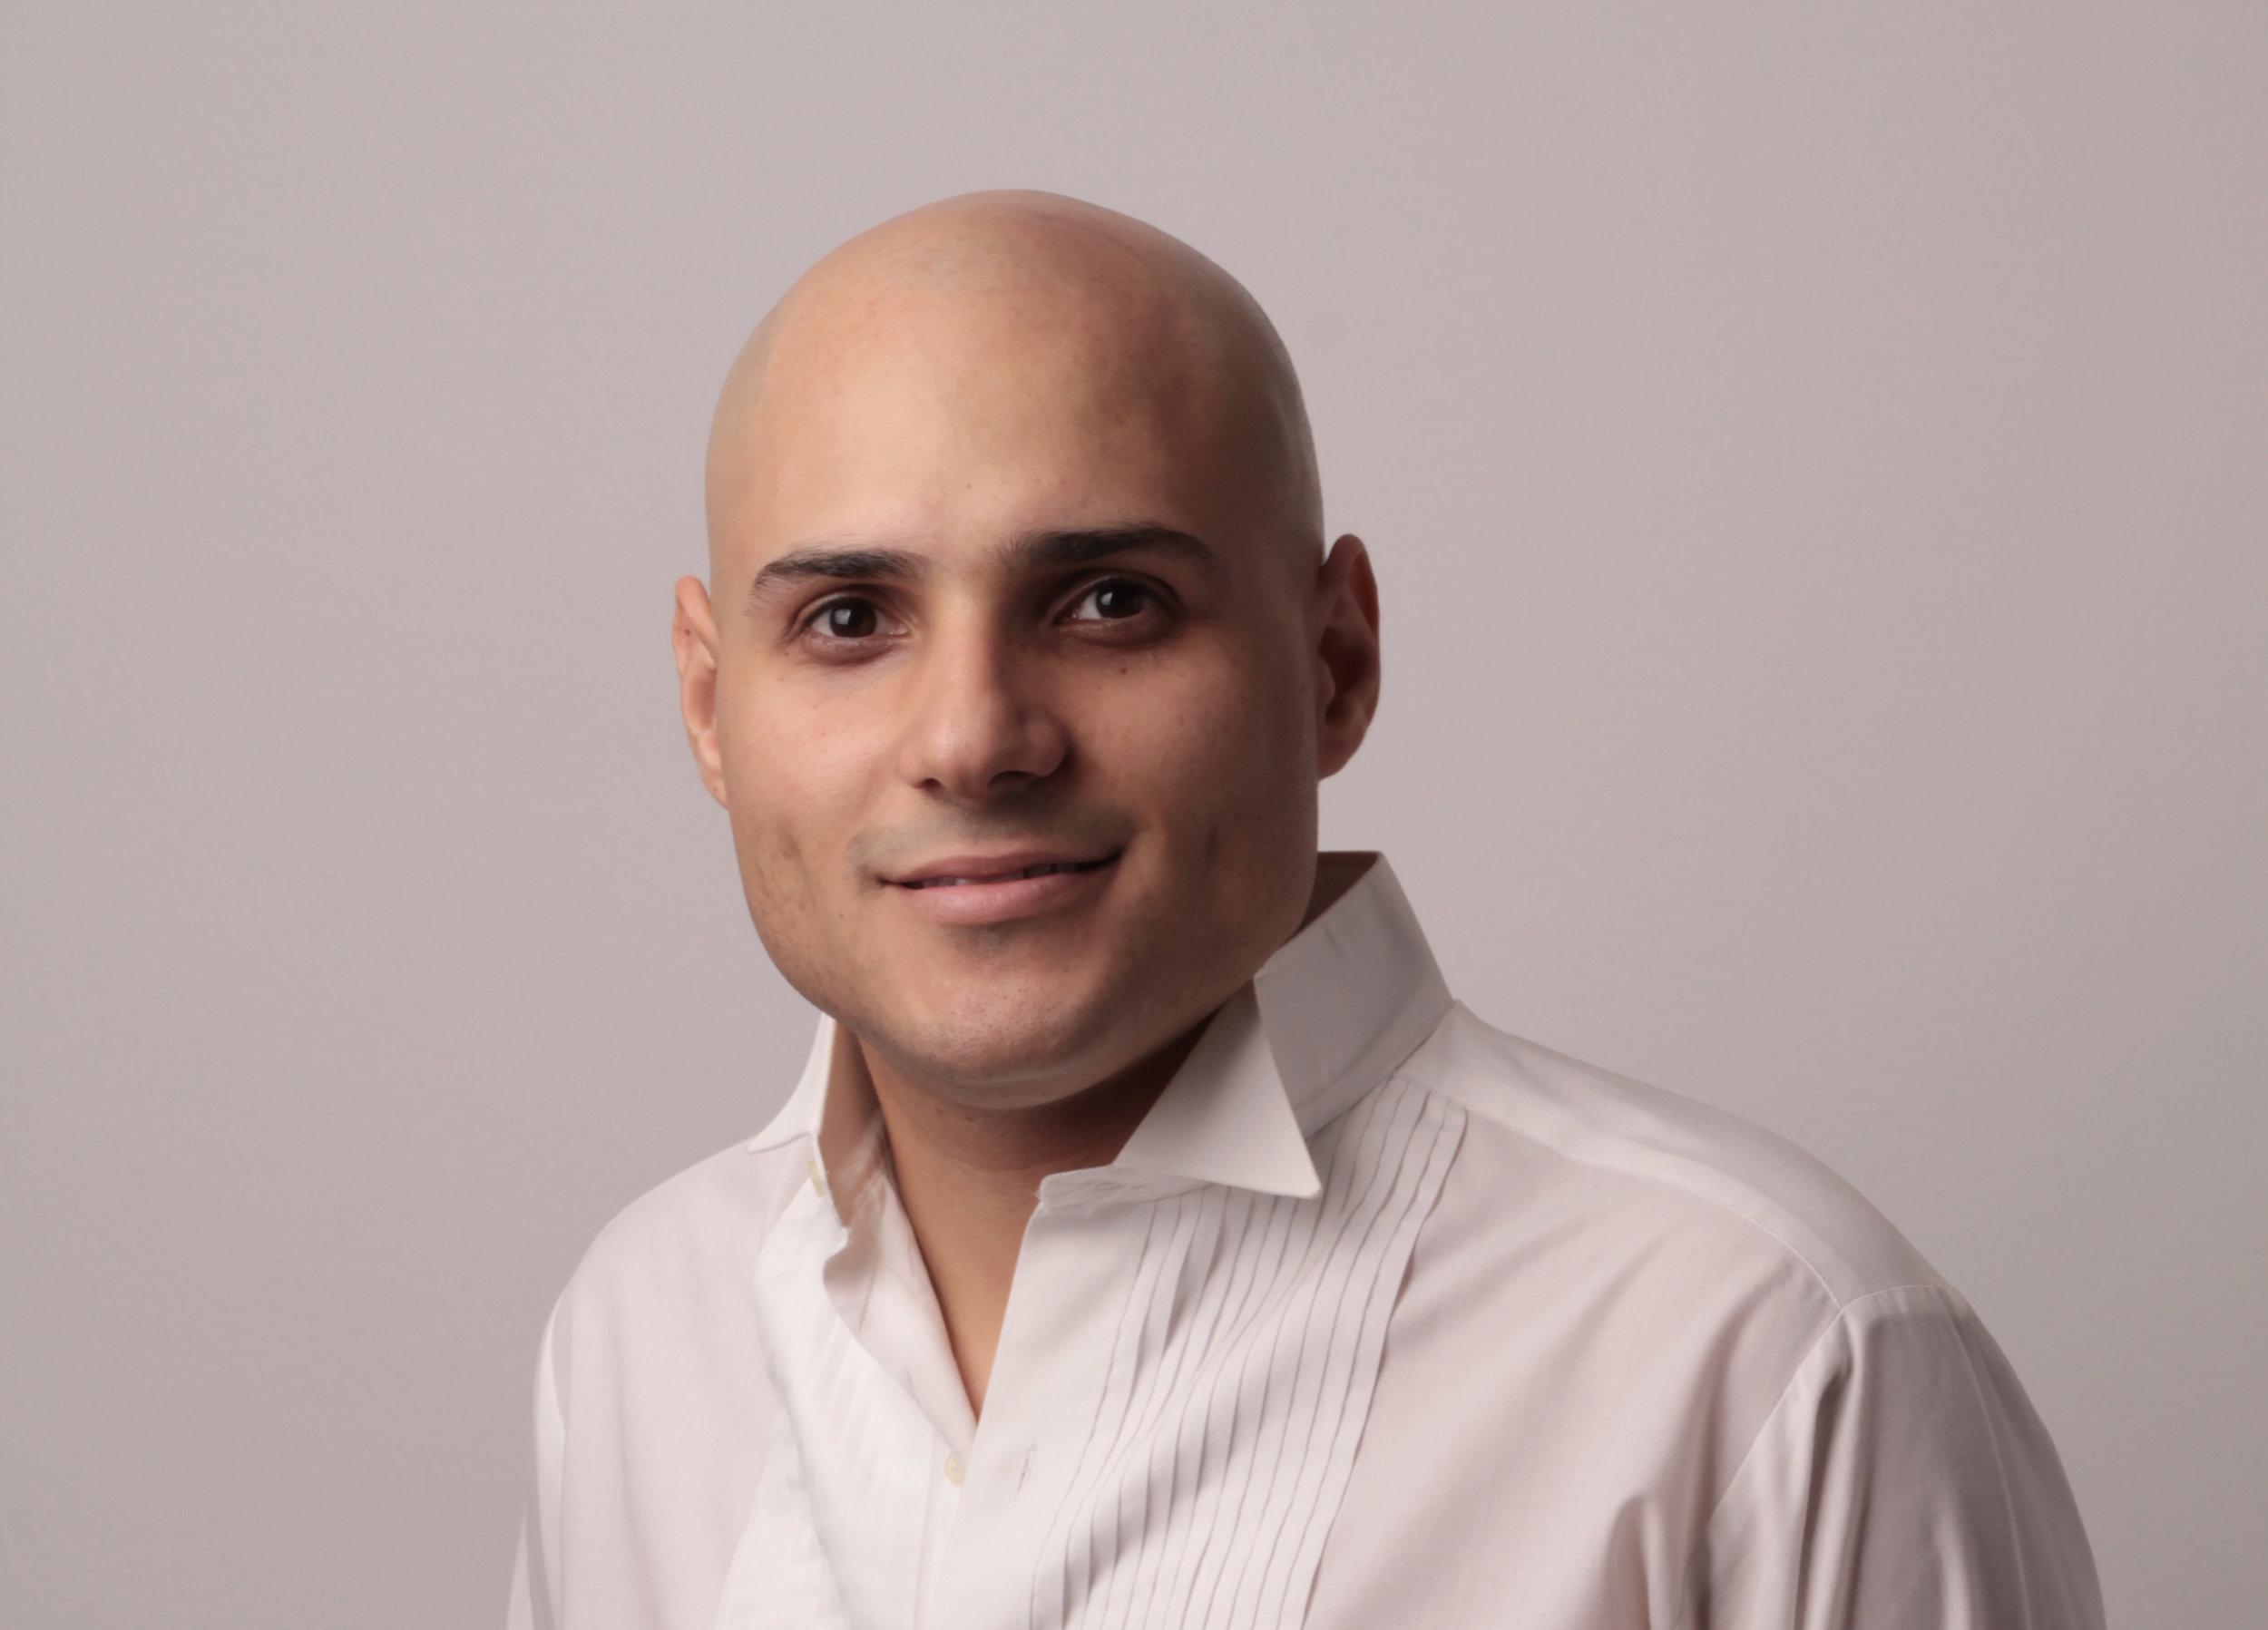 Alex Martinez Suarez